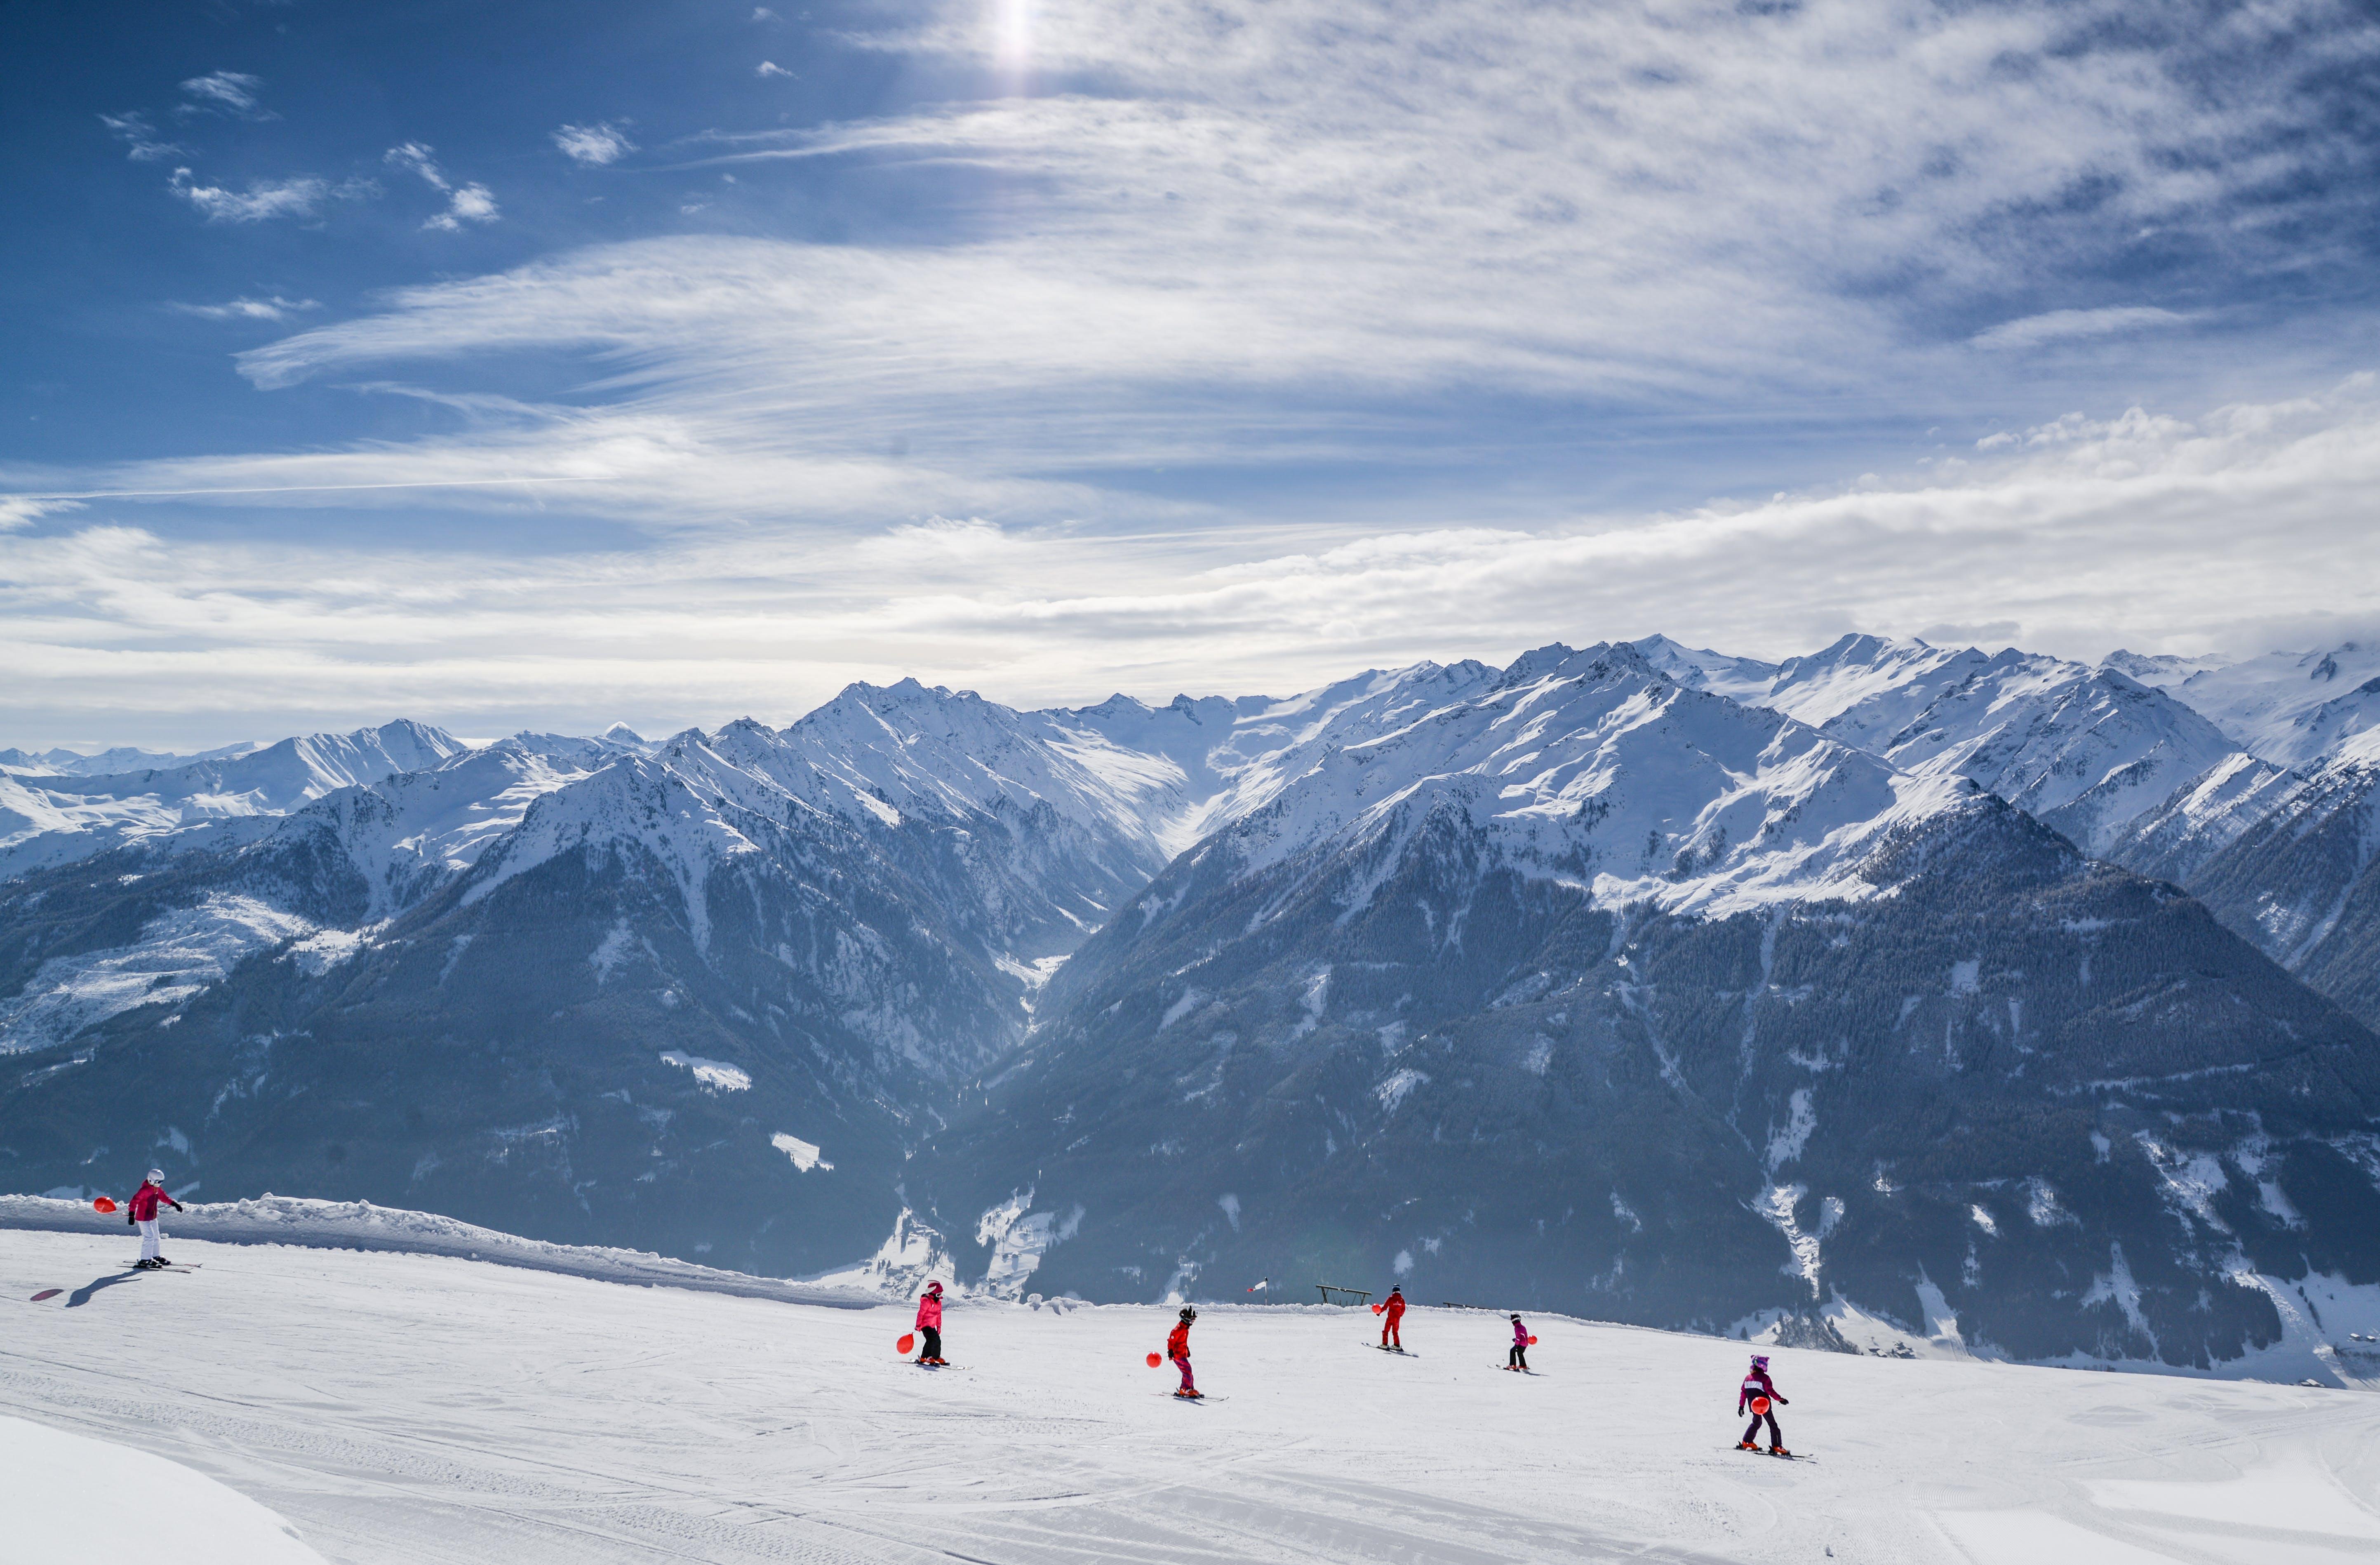 People on Skiing